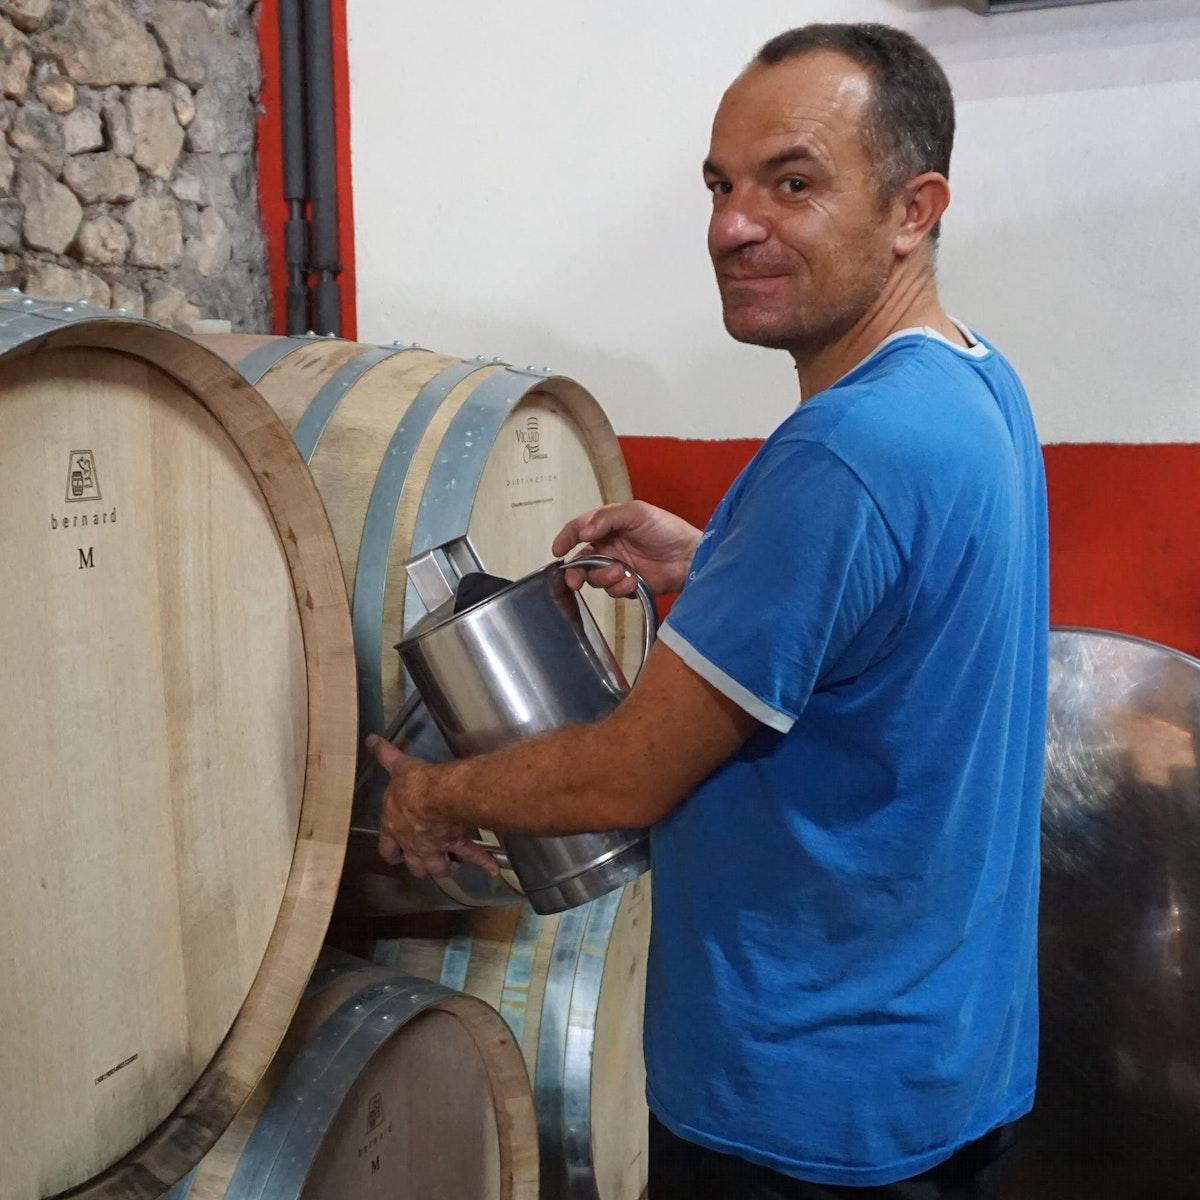 Chardonnay Advocate